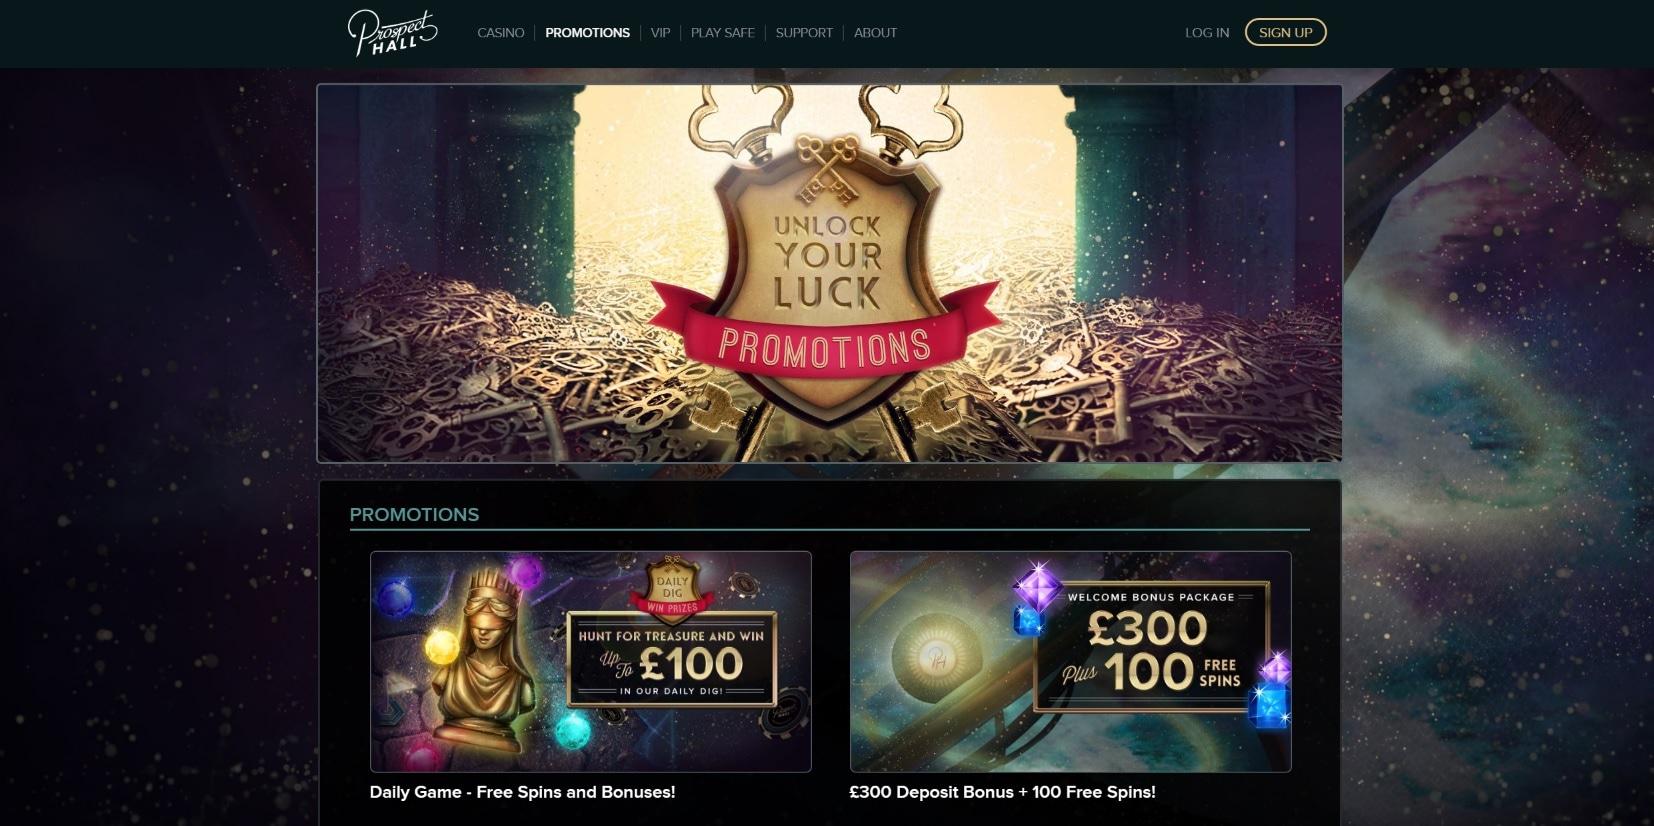 paypal casino site prospect hall bonus